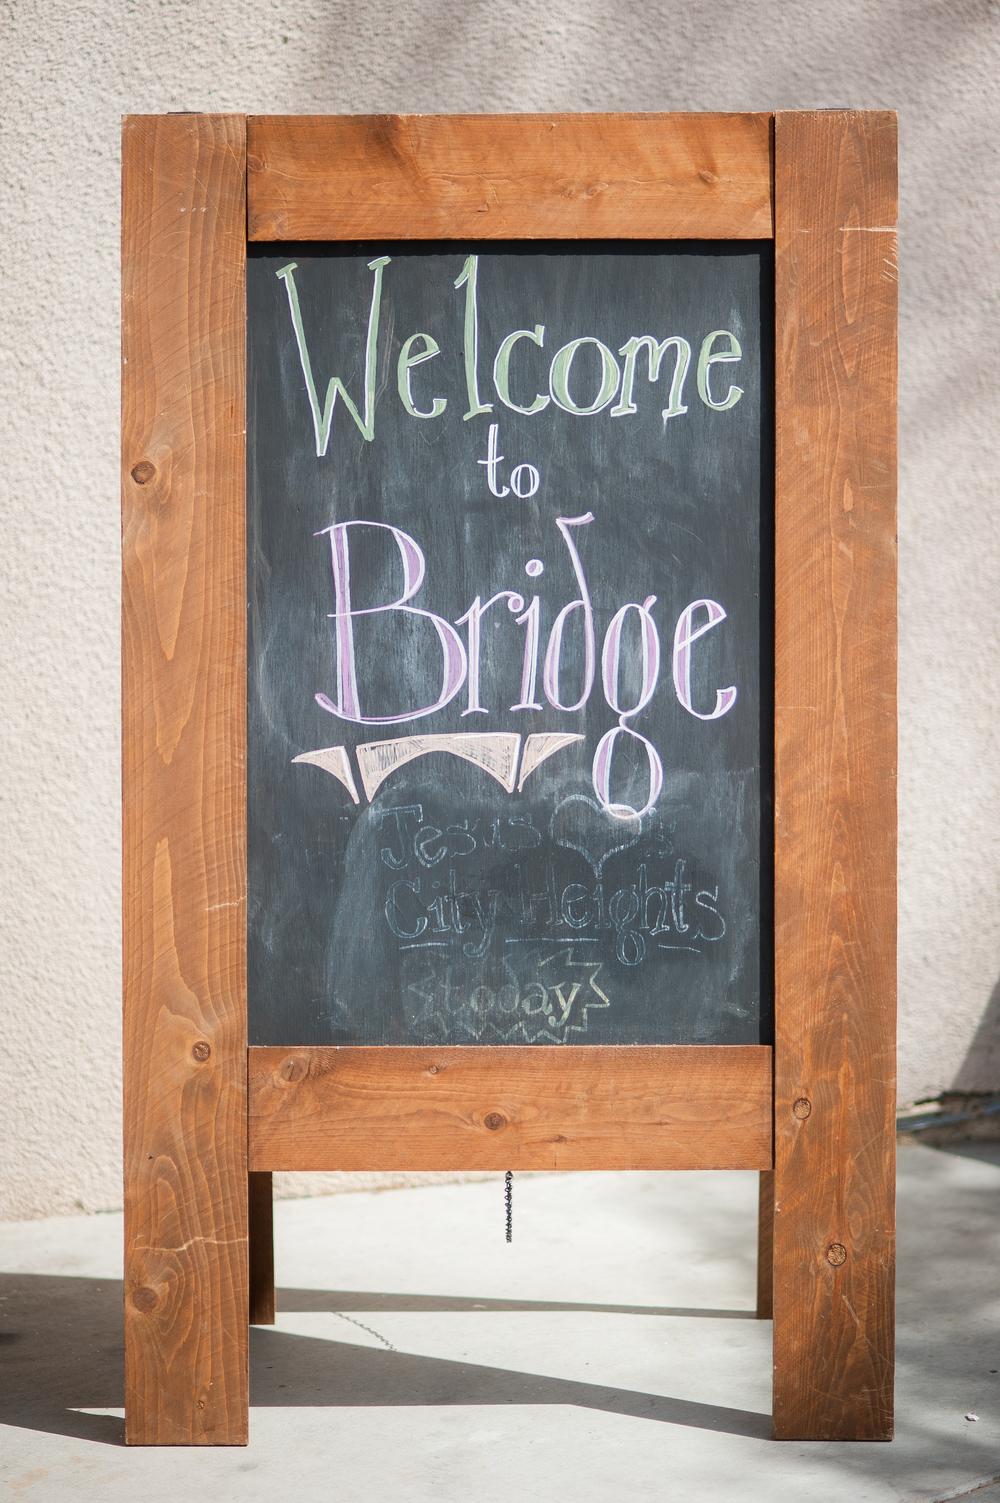 BridgeEaster2015-8.jpg